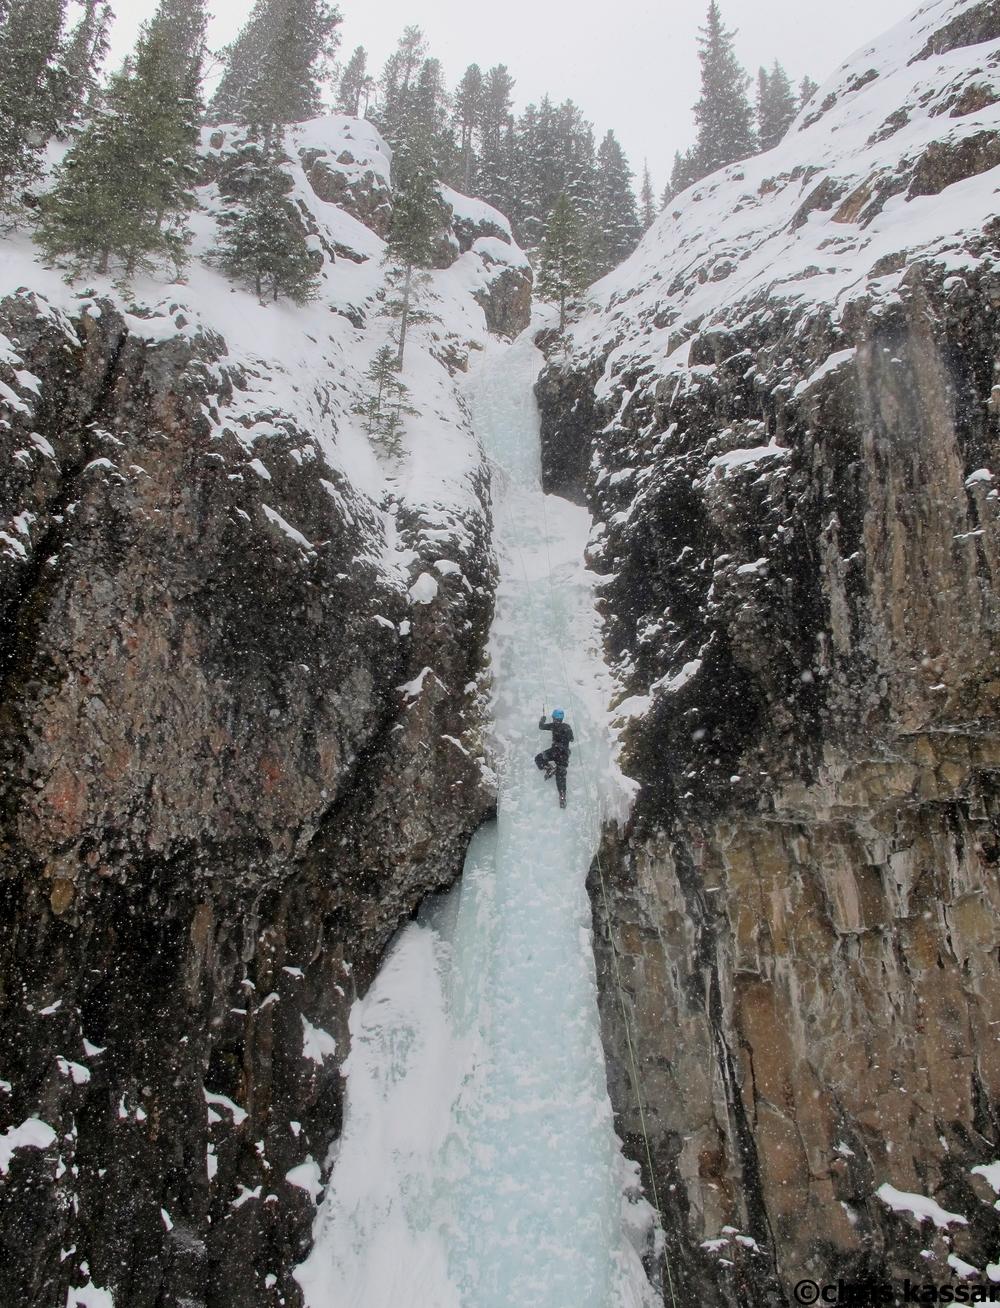 Hyalite_Canyon_Climbing_Ice (5).jpg